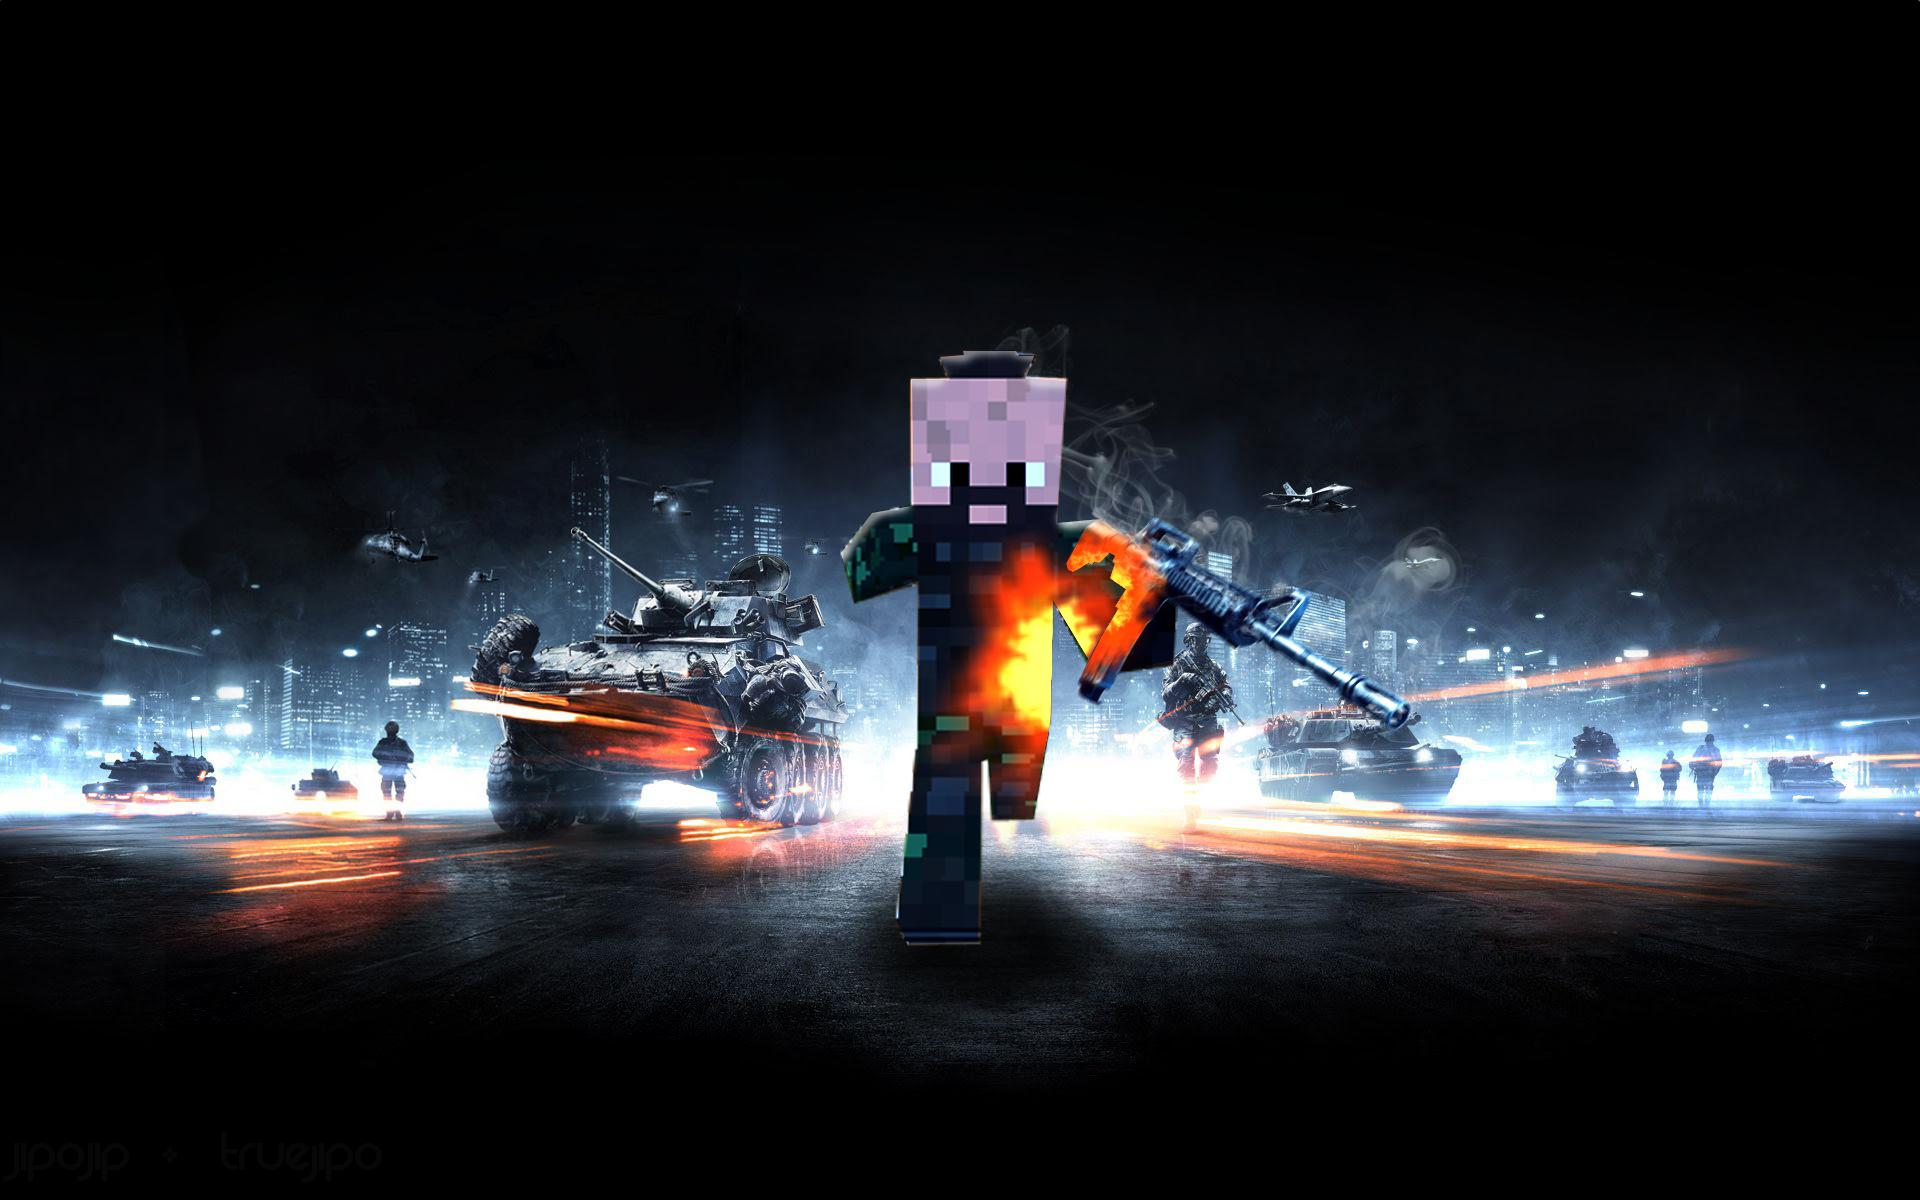 Must see Wallpaper Minecraft Computer - minecraft-wallpaper-download-18  Picture_4675.jpg